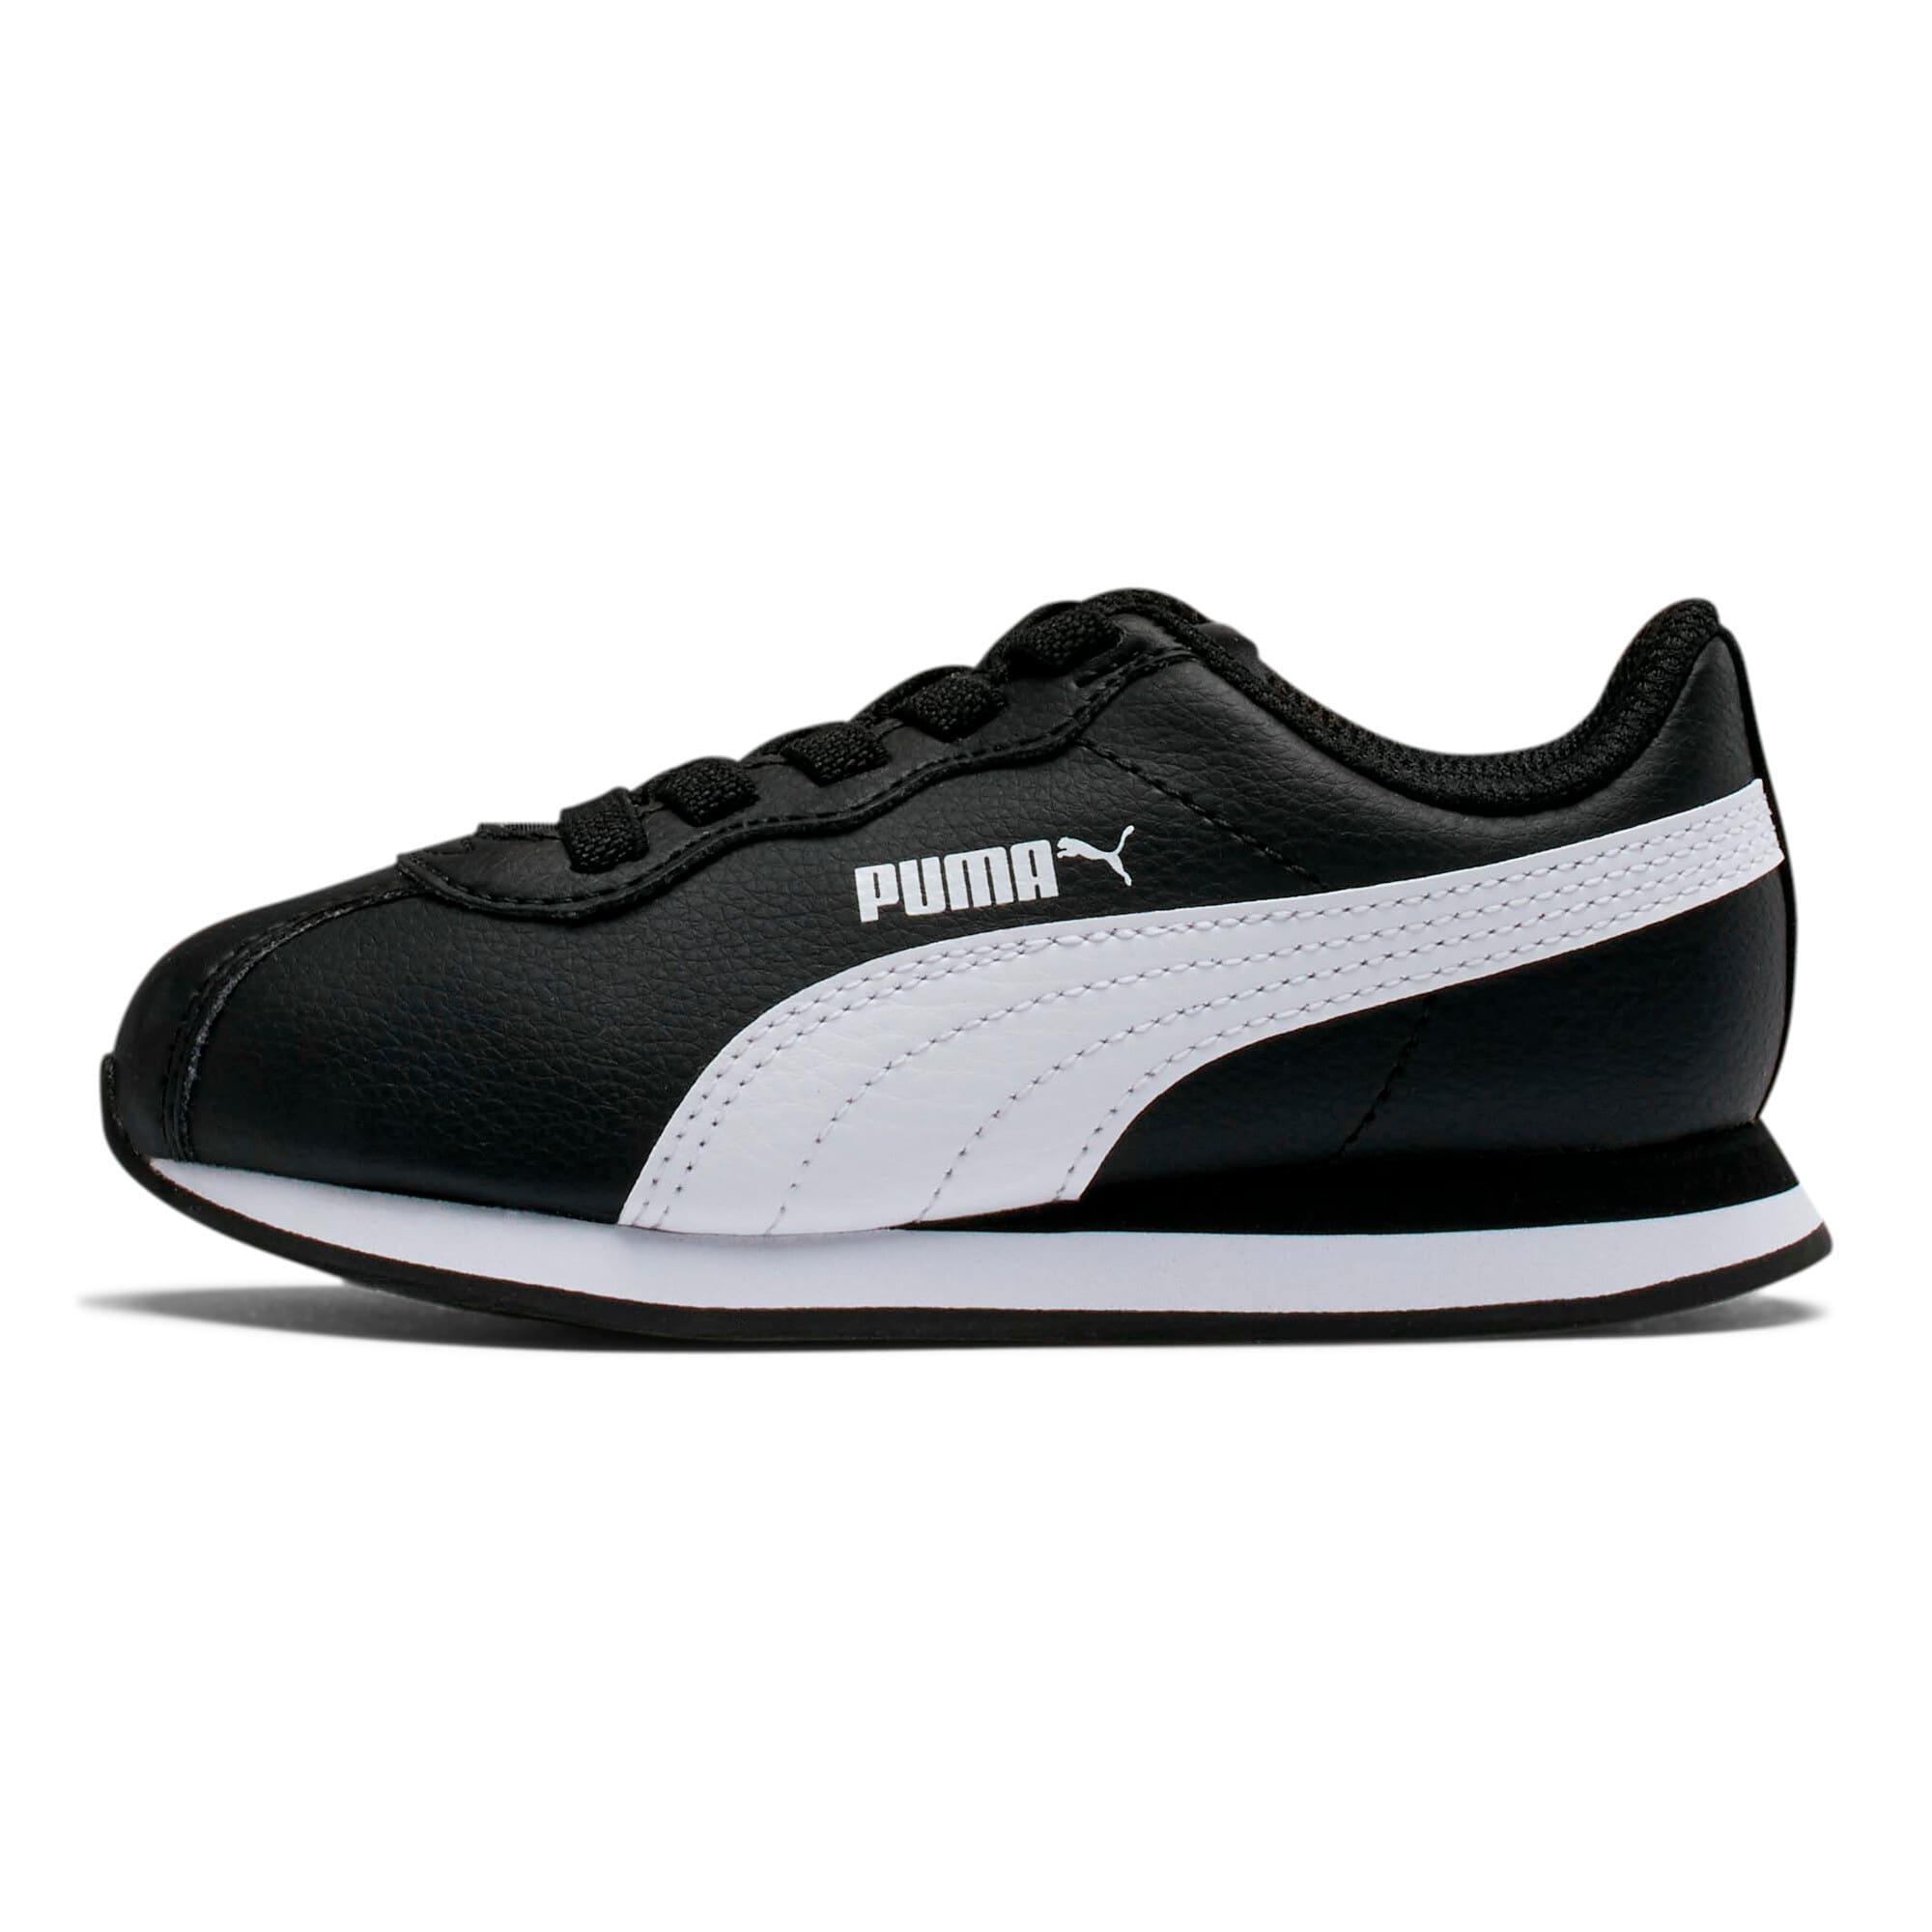 Thumbnail 1 of Turin II AC Kids' Trainers, Puma Black-Puma White, medium-IND